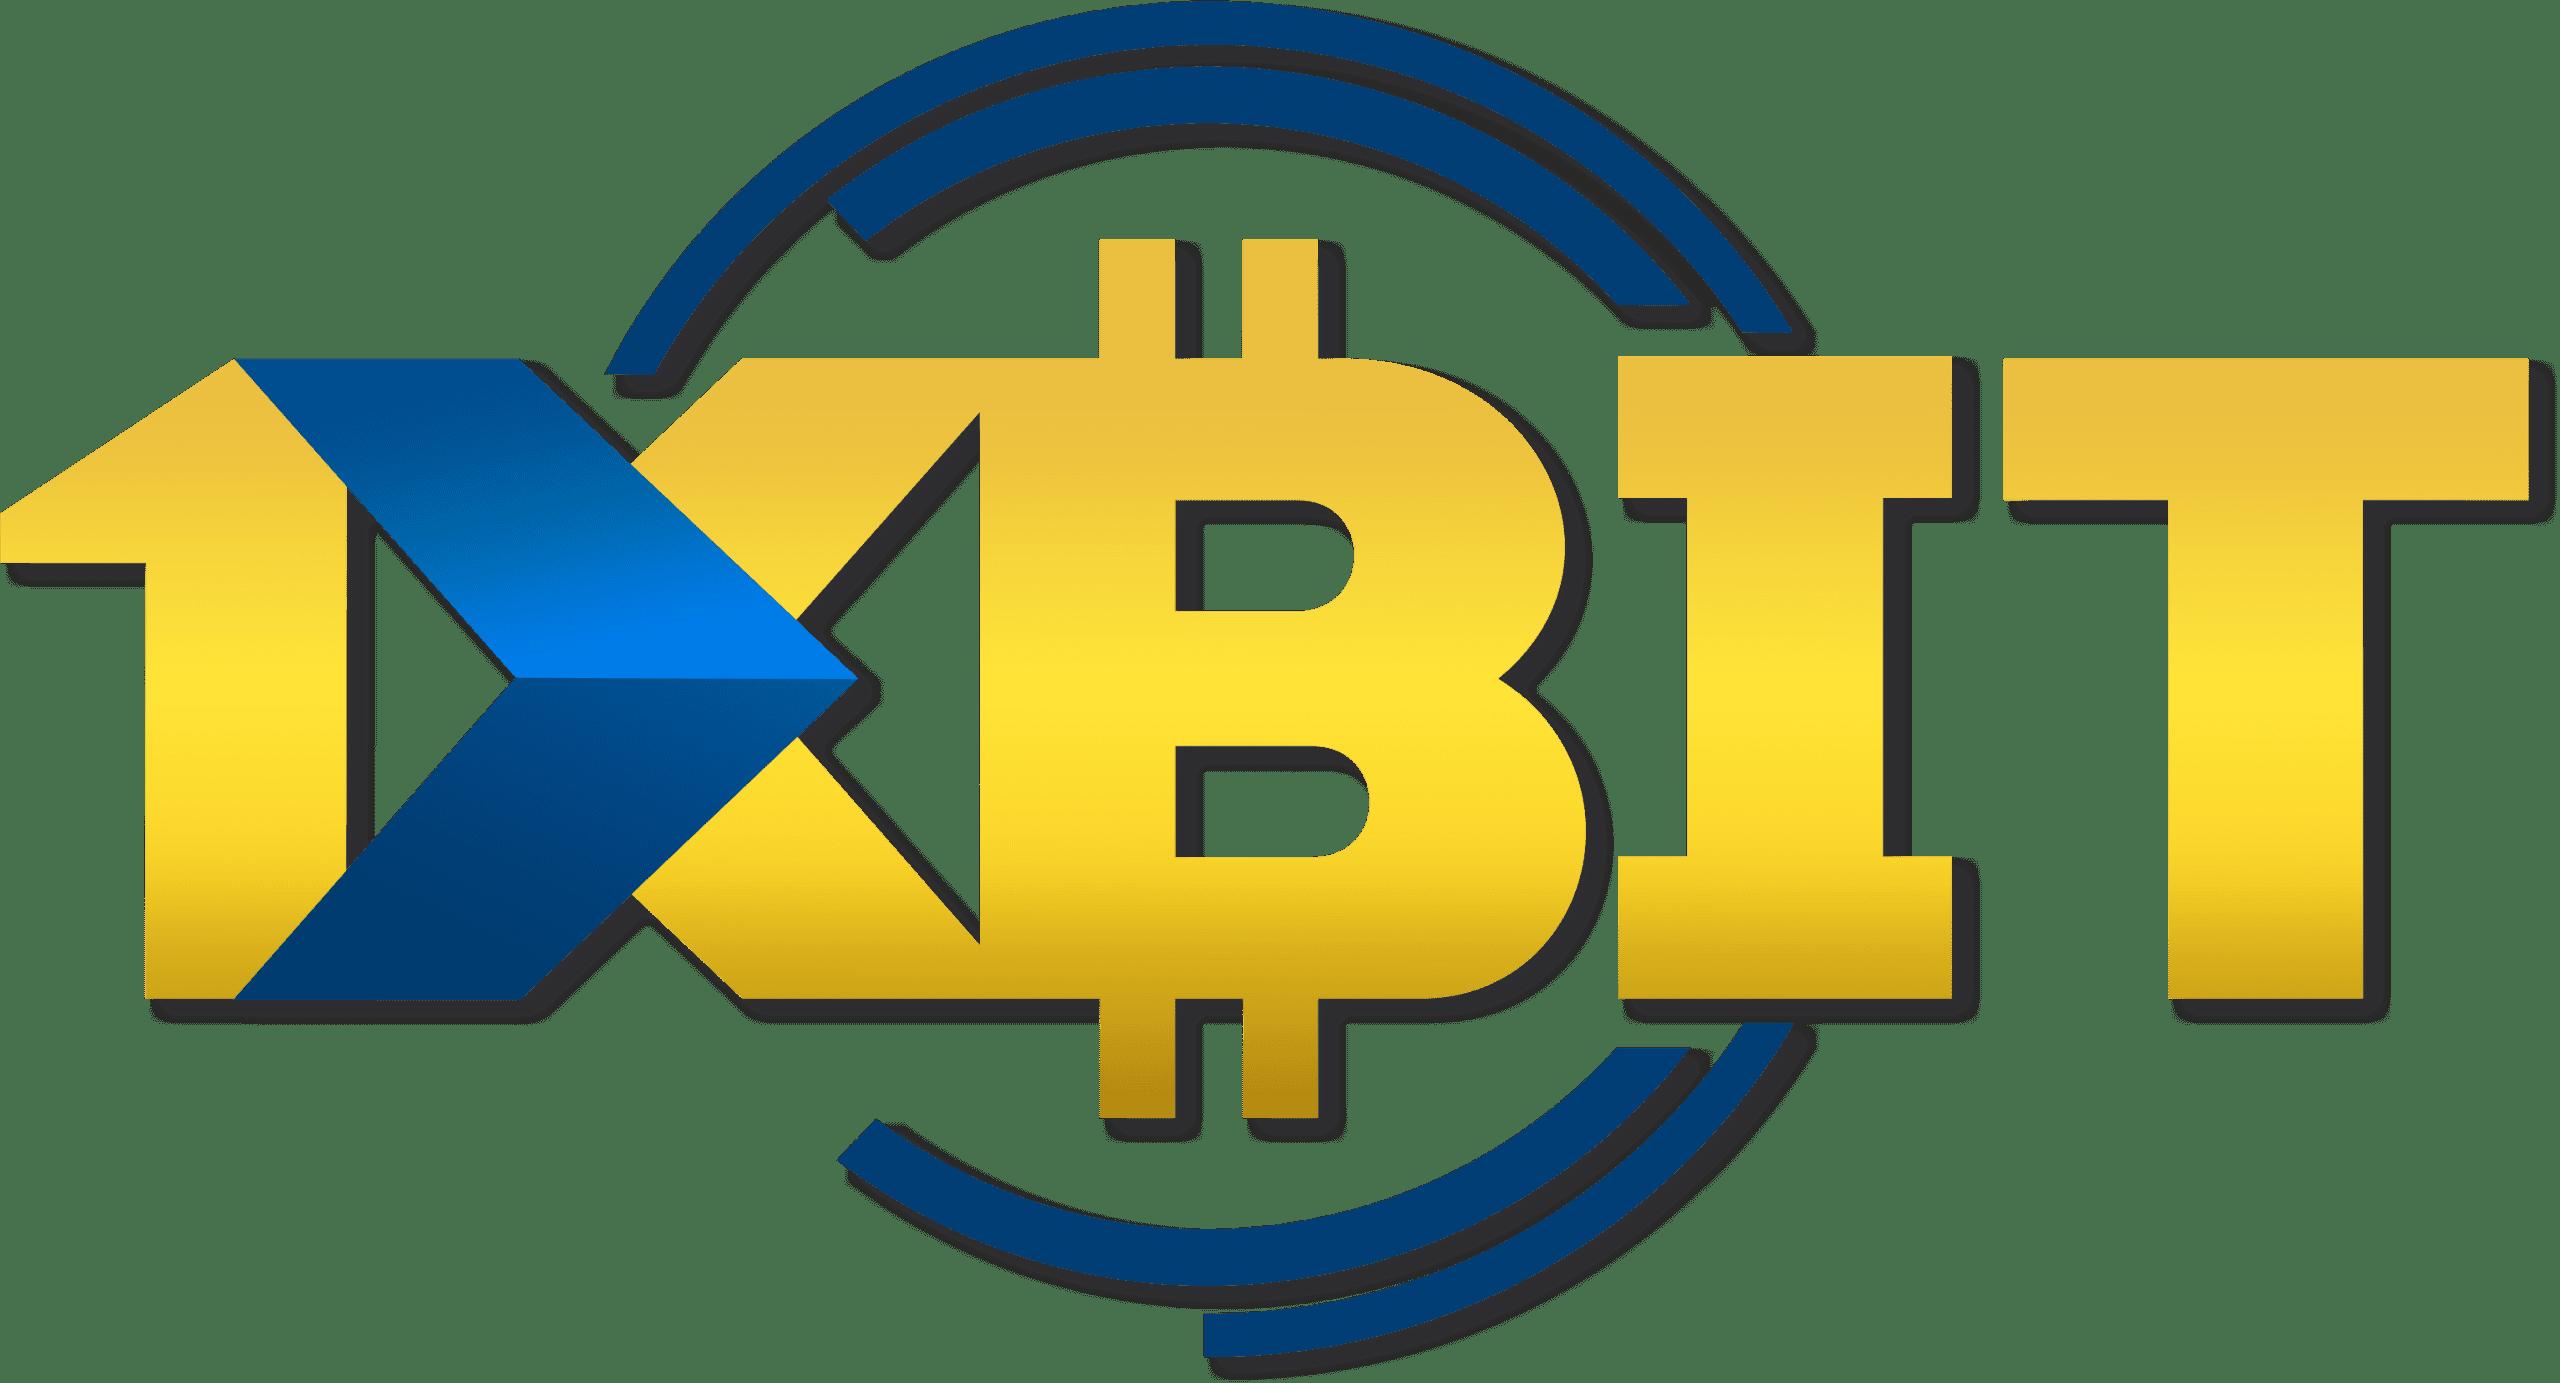 1xBit Online Casino Review | UseTheBitcoin